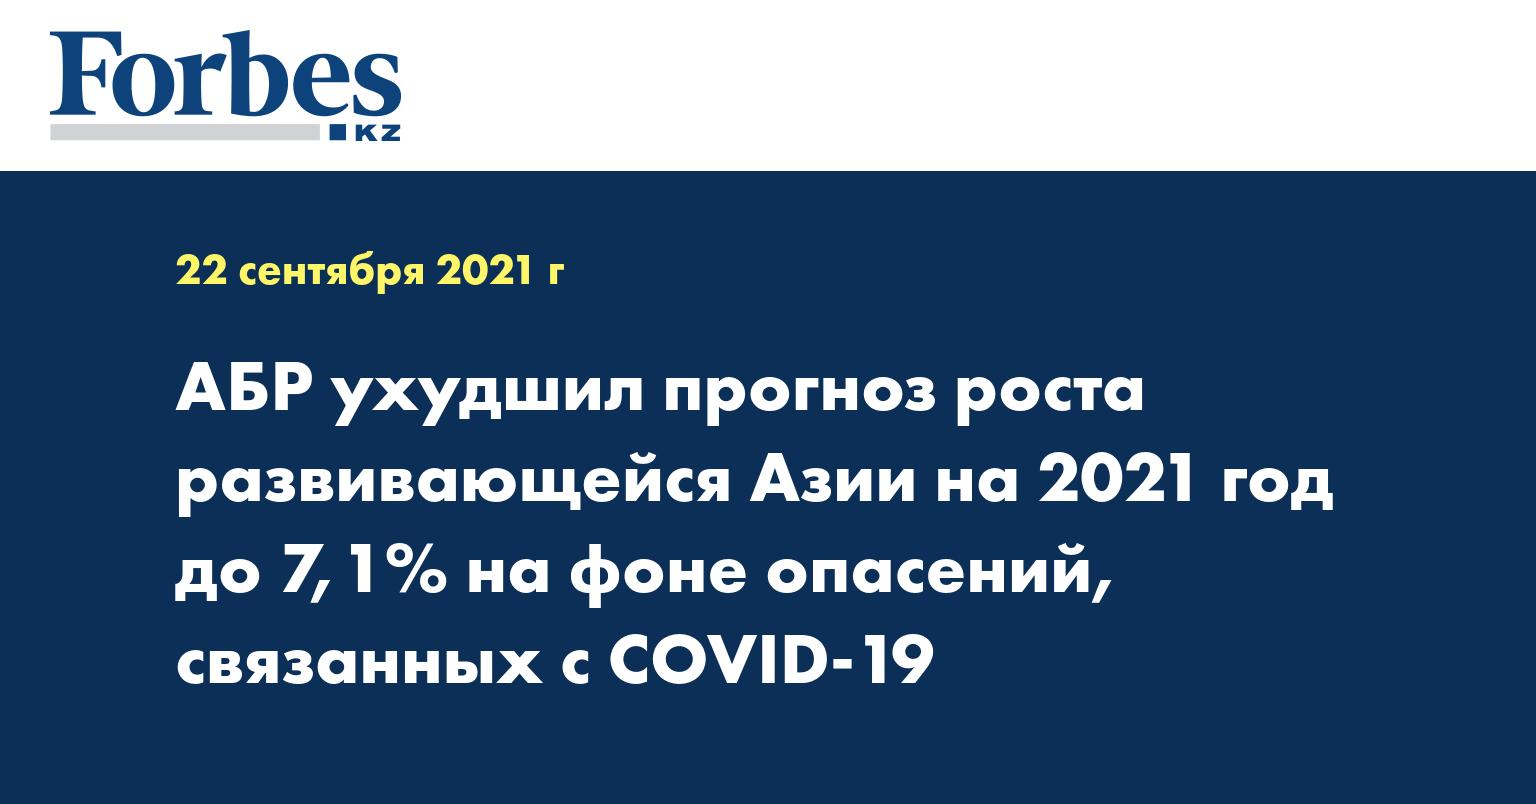 АБР ухудшил прогноз роста развивающейся Азии на 2021 год до 7,1% на фоне опасений,  связанных с COVID-19